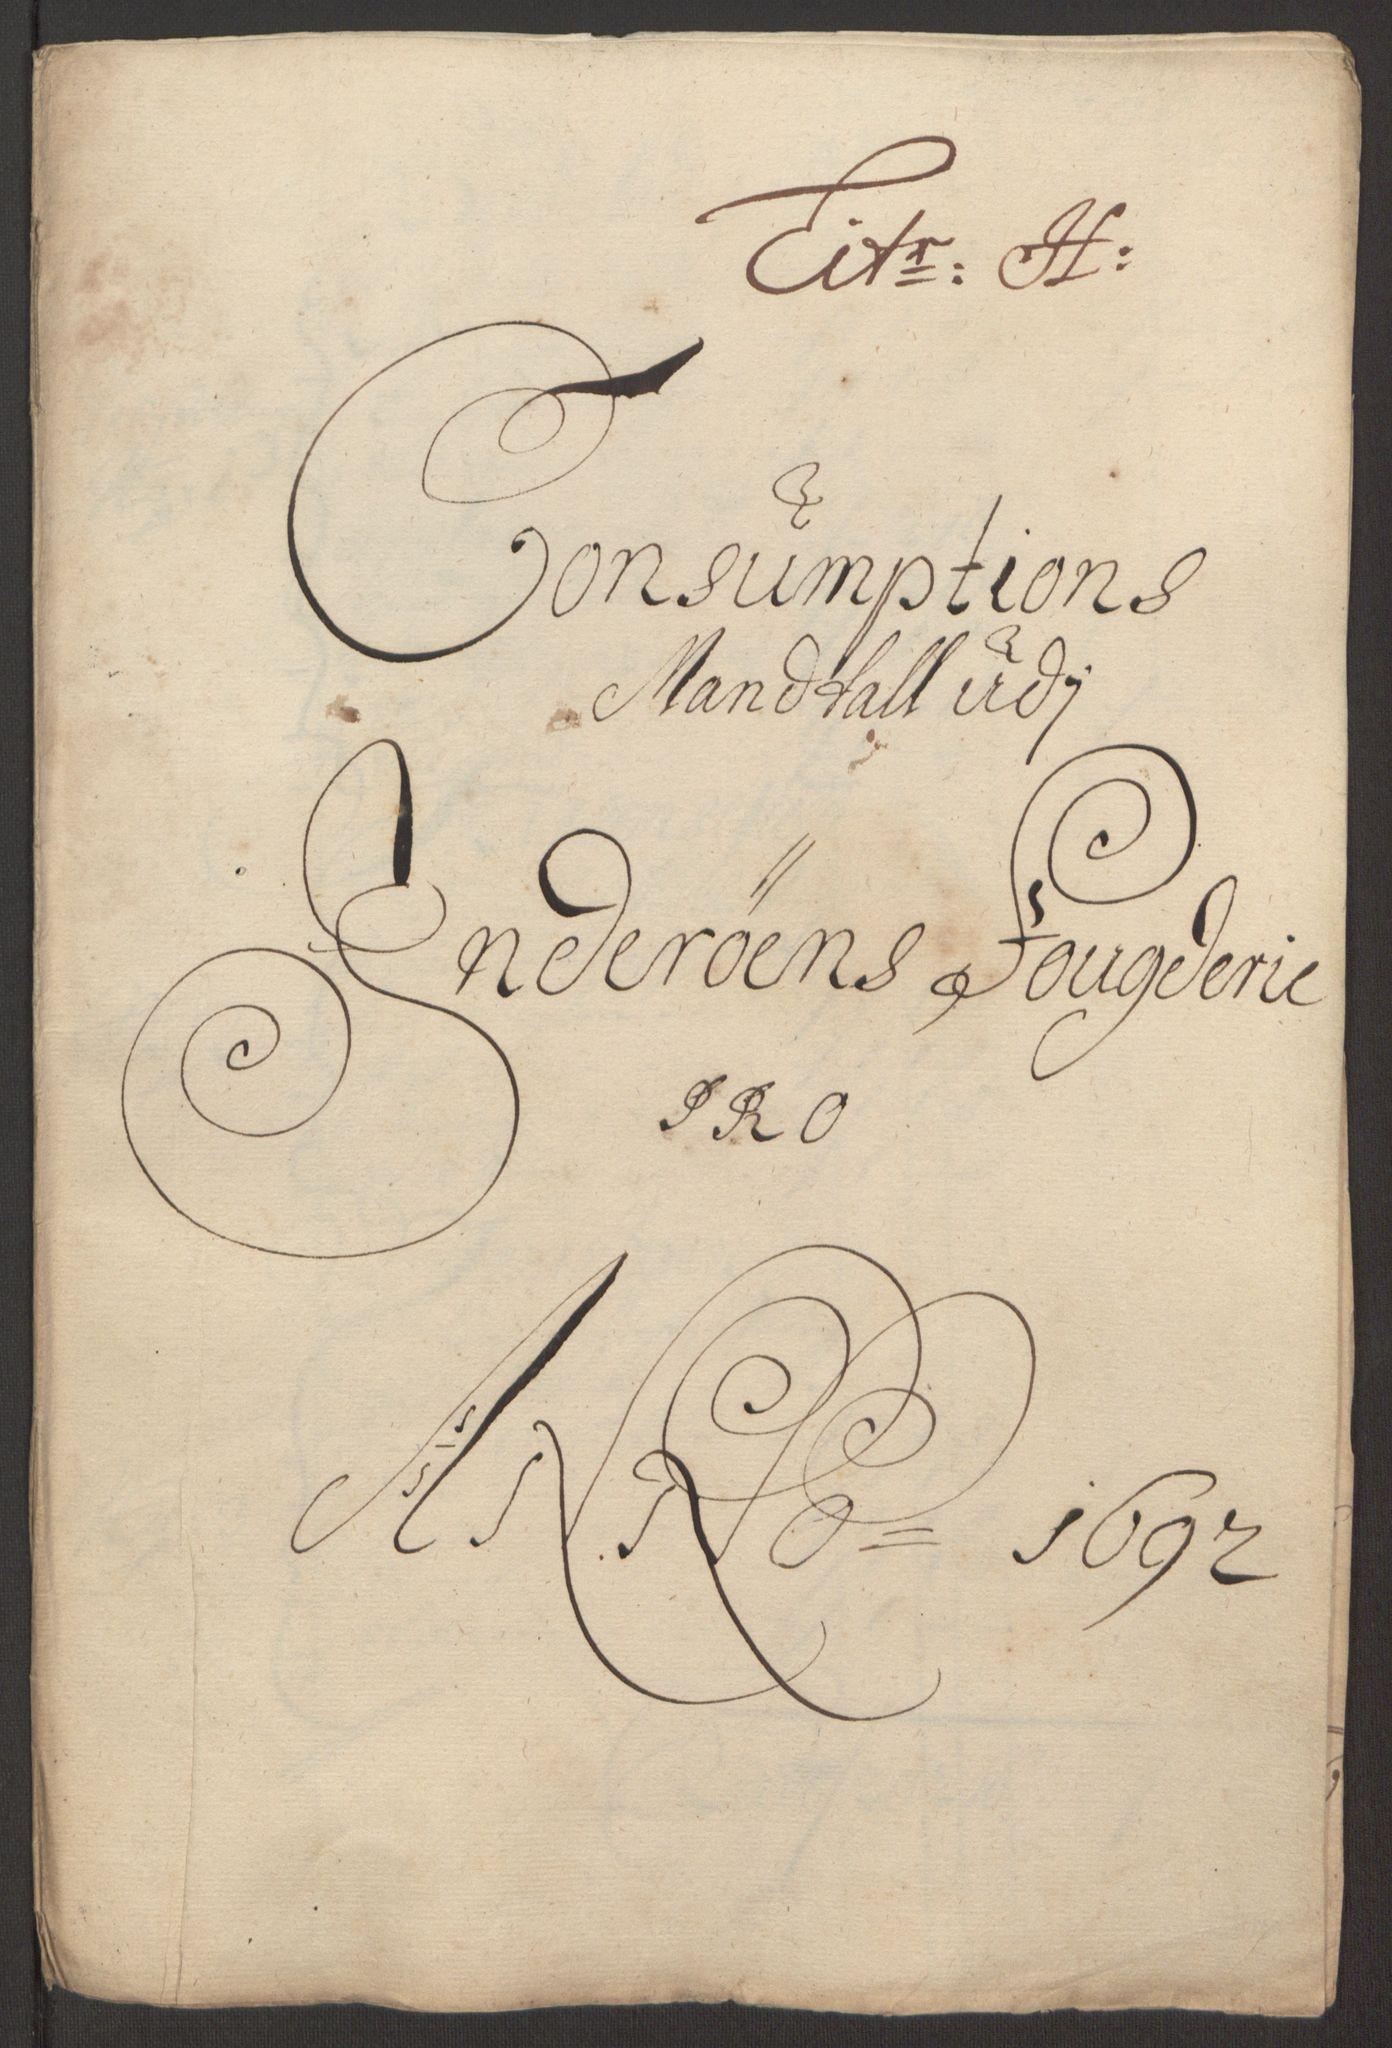 RA, Rentekammeret inntil 1814, Reviderte regnskaper, Fogderegnskap, R63/L4308: Fogderegnskap Inderøy, 1692-1694, s. 118